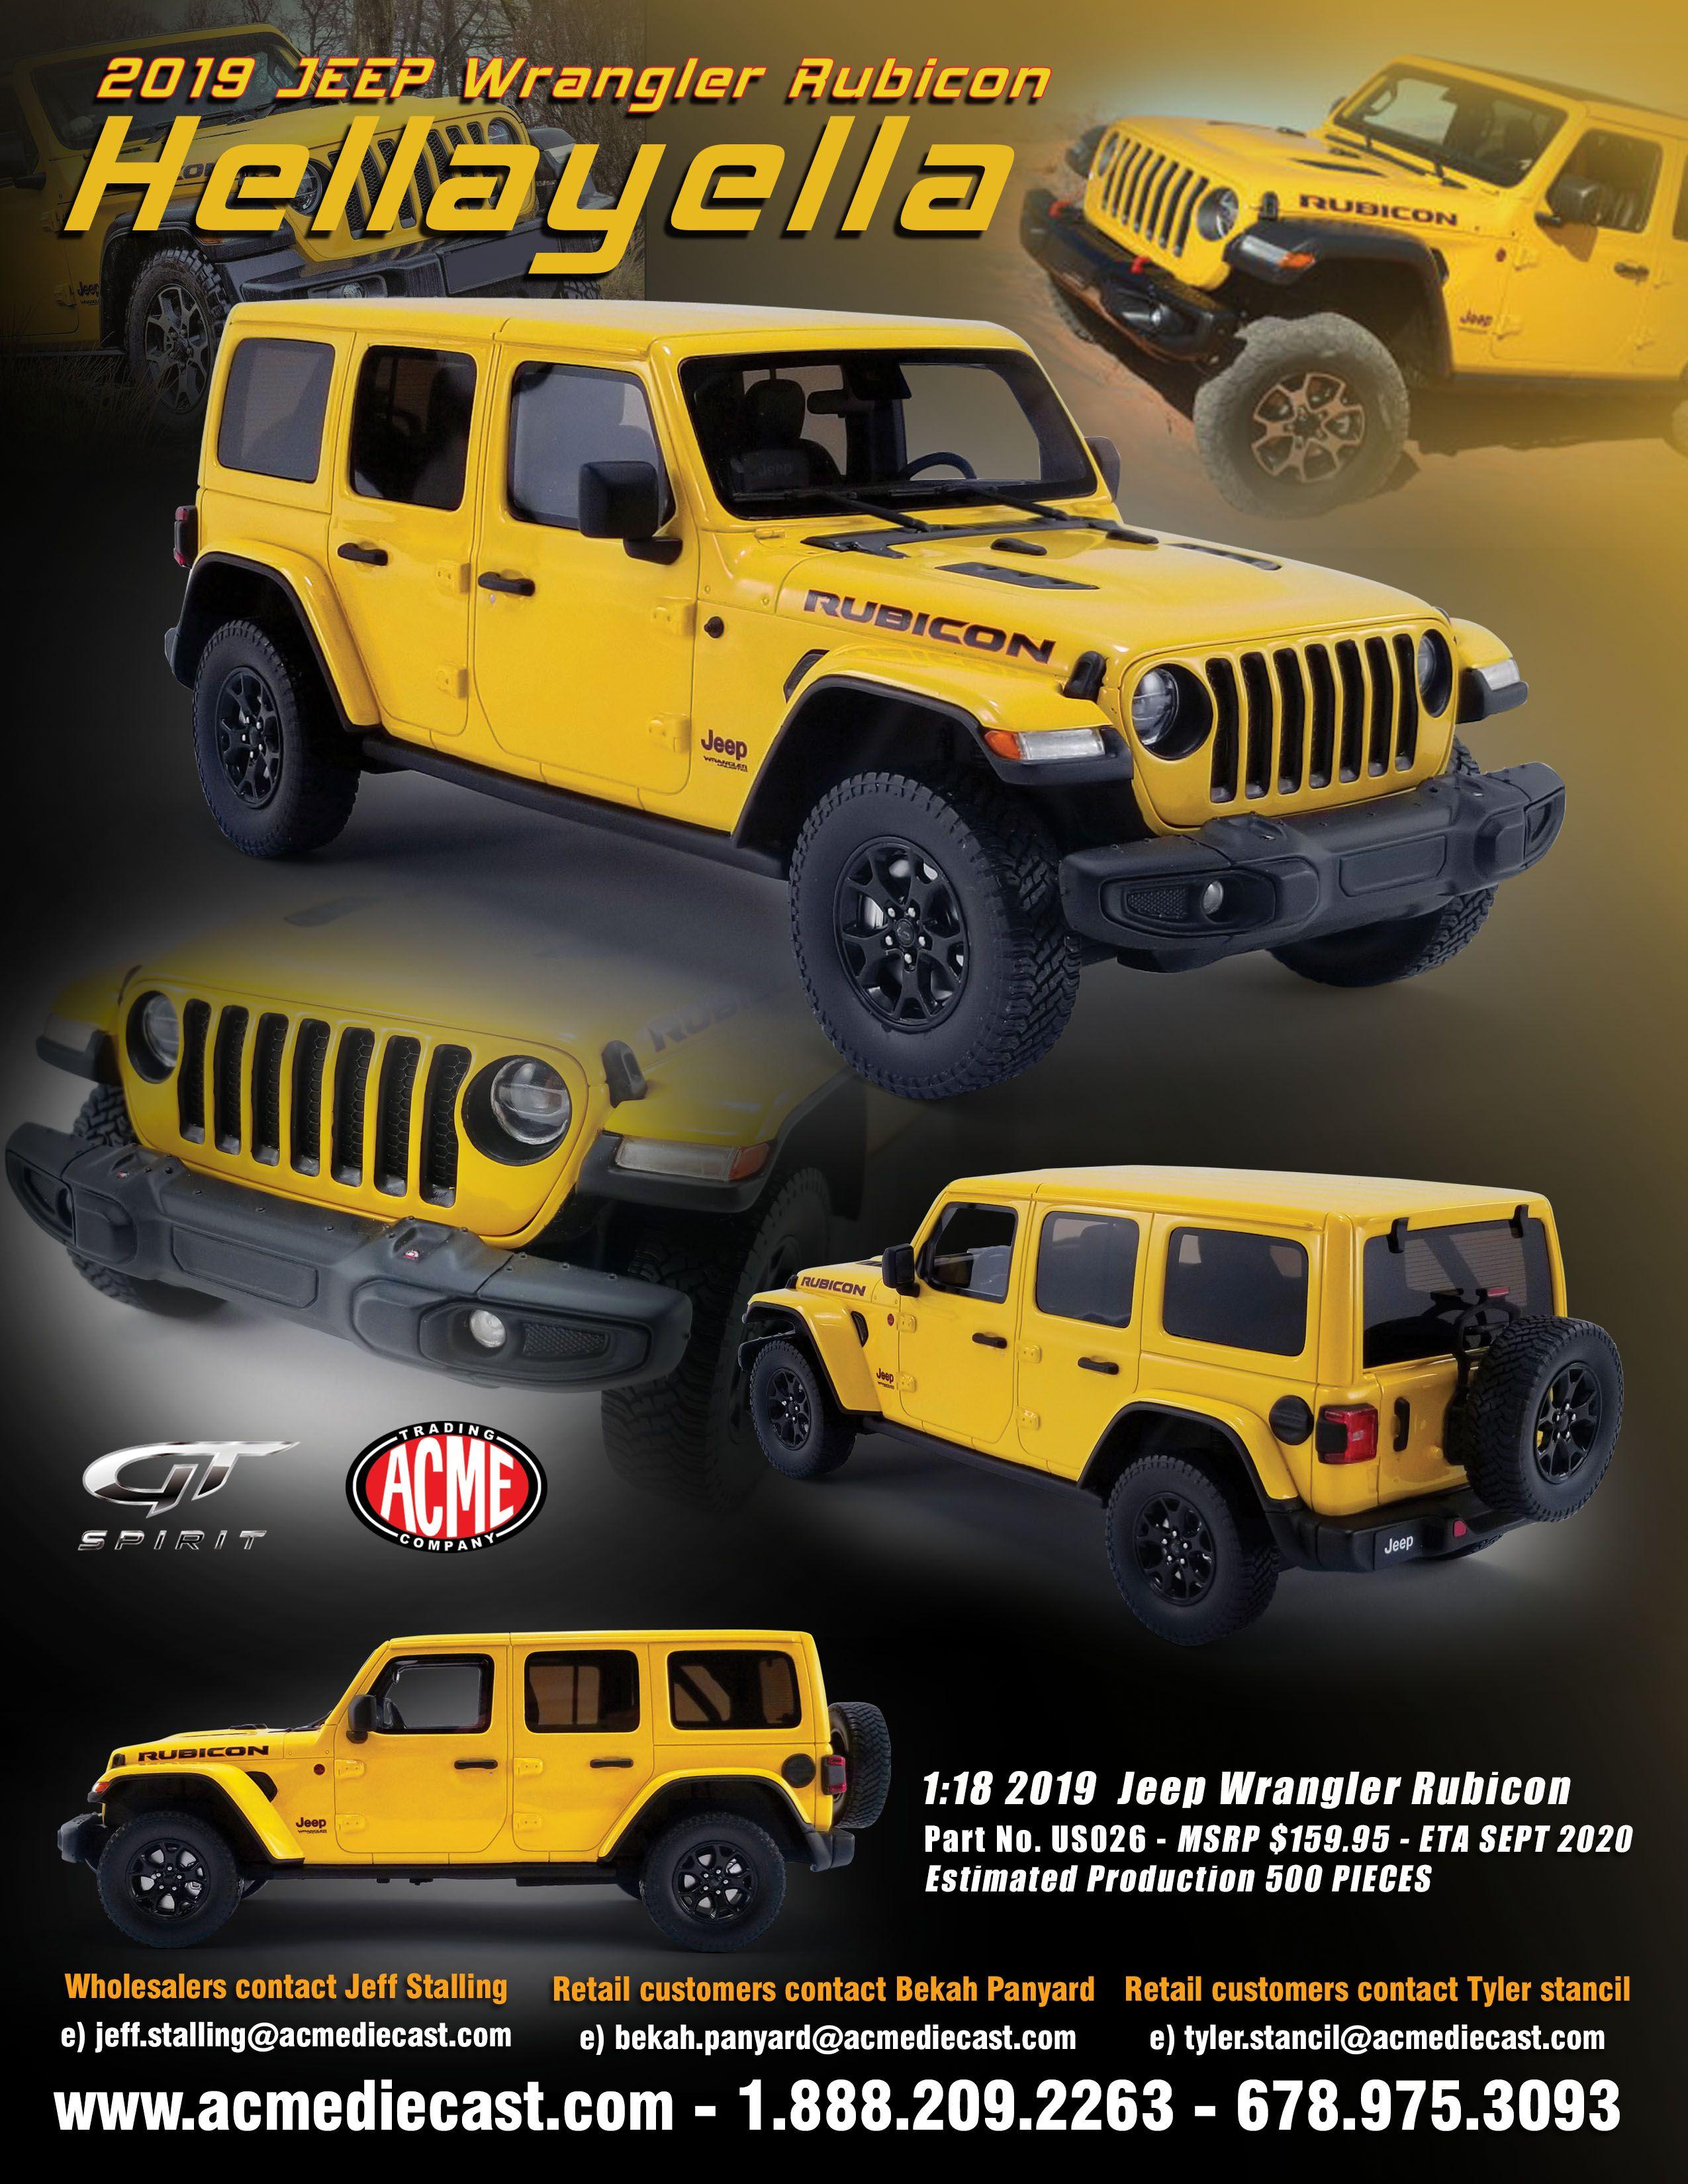 Fastest Jeep Wrangler : fastest, wrangler, Wrangler, Rubicon, HellaYella, Wrangler,, Rubicon,